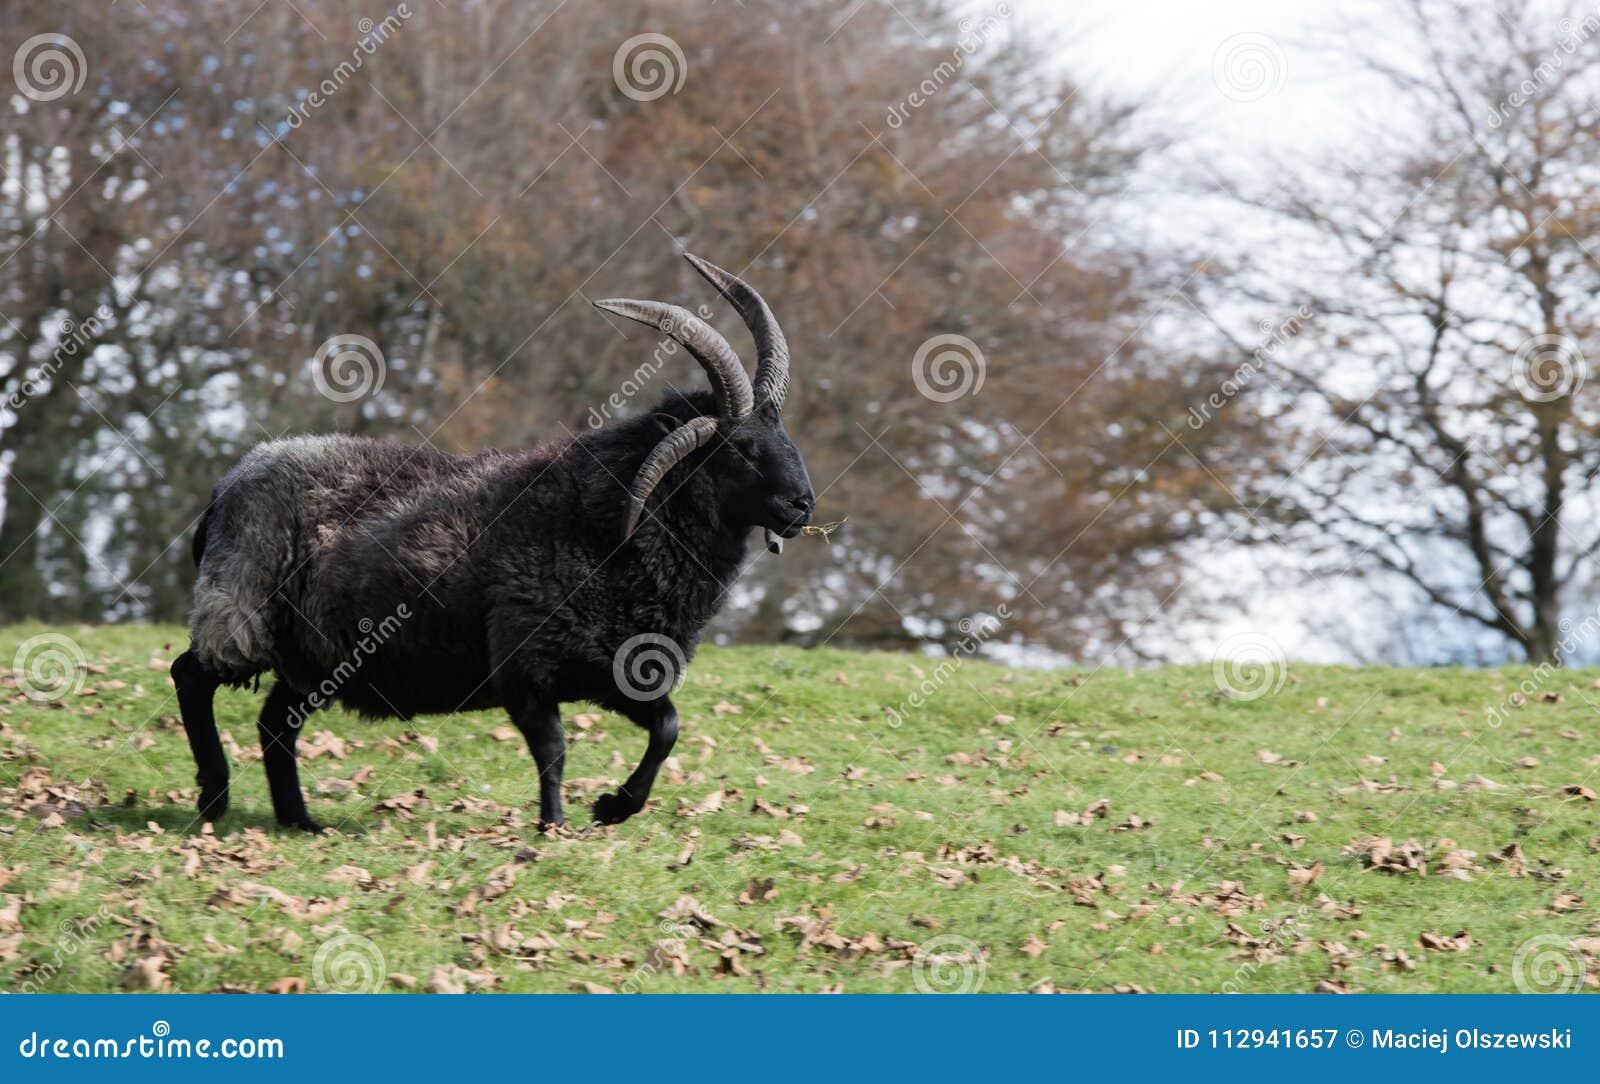 Ram, Sheep, Lamb, Ovis aries